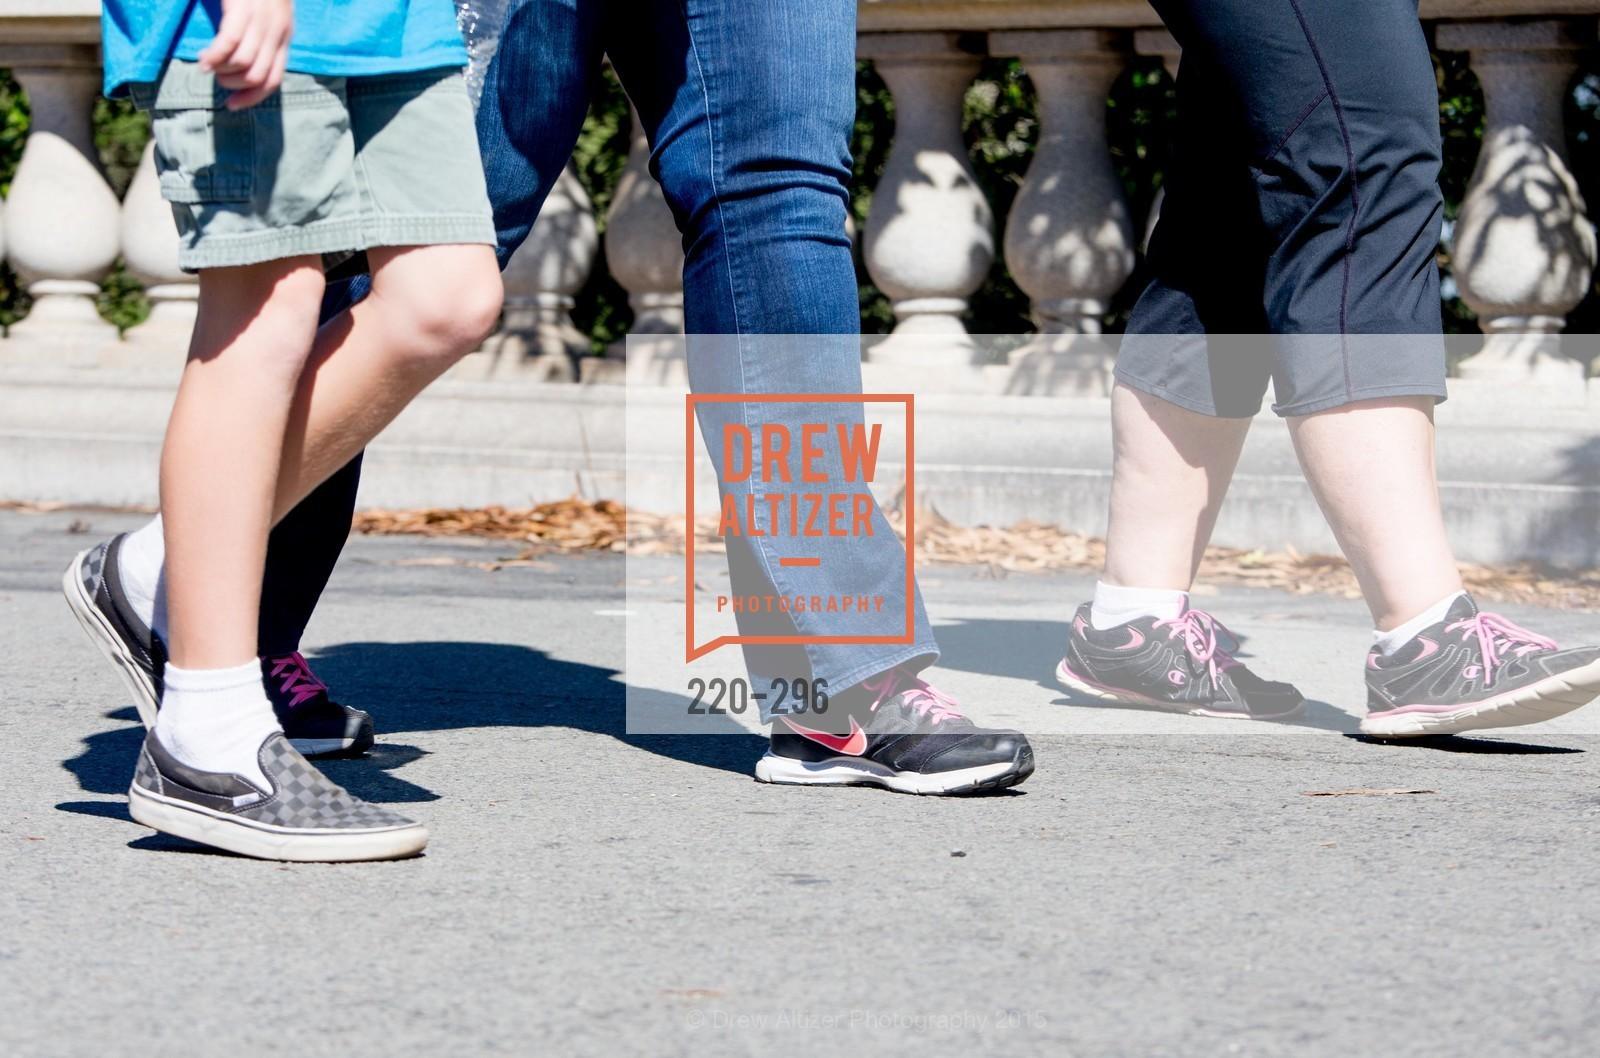 Atmosphere, American Liver Foundation - San Francisco Liver Life Walk 2015, September 20th, 2015, Photo,Drew Altizer, Drew Altizer Photography, full-service event agency, private events, San Francisco photographer, photographer California